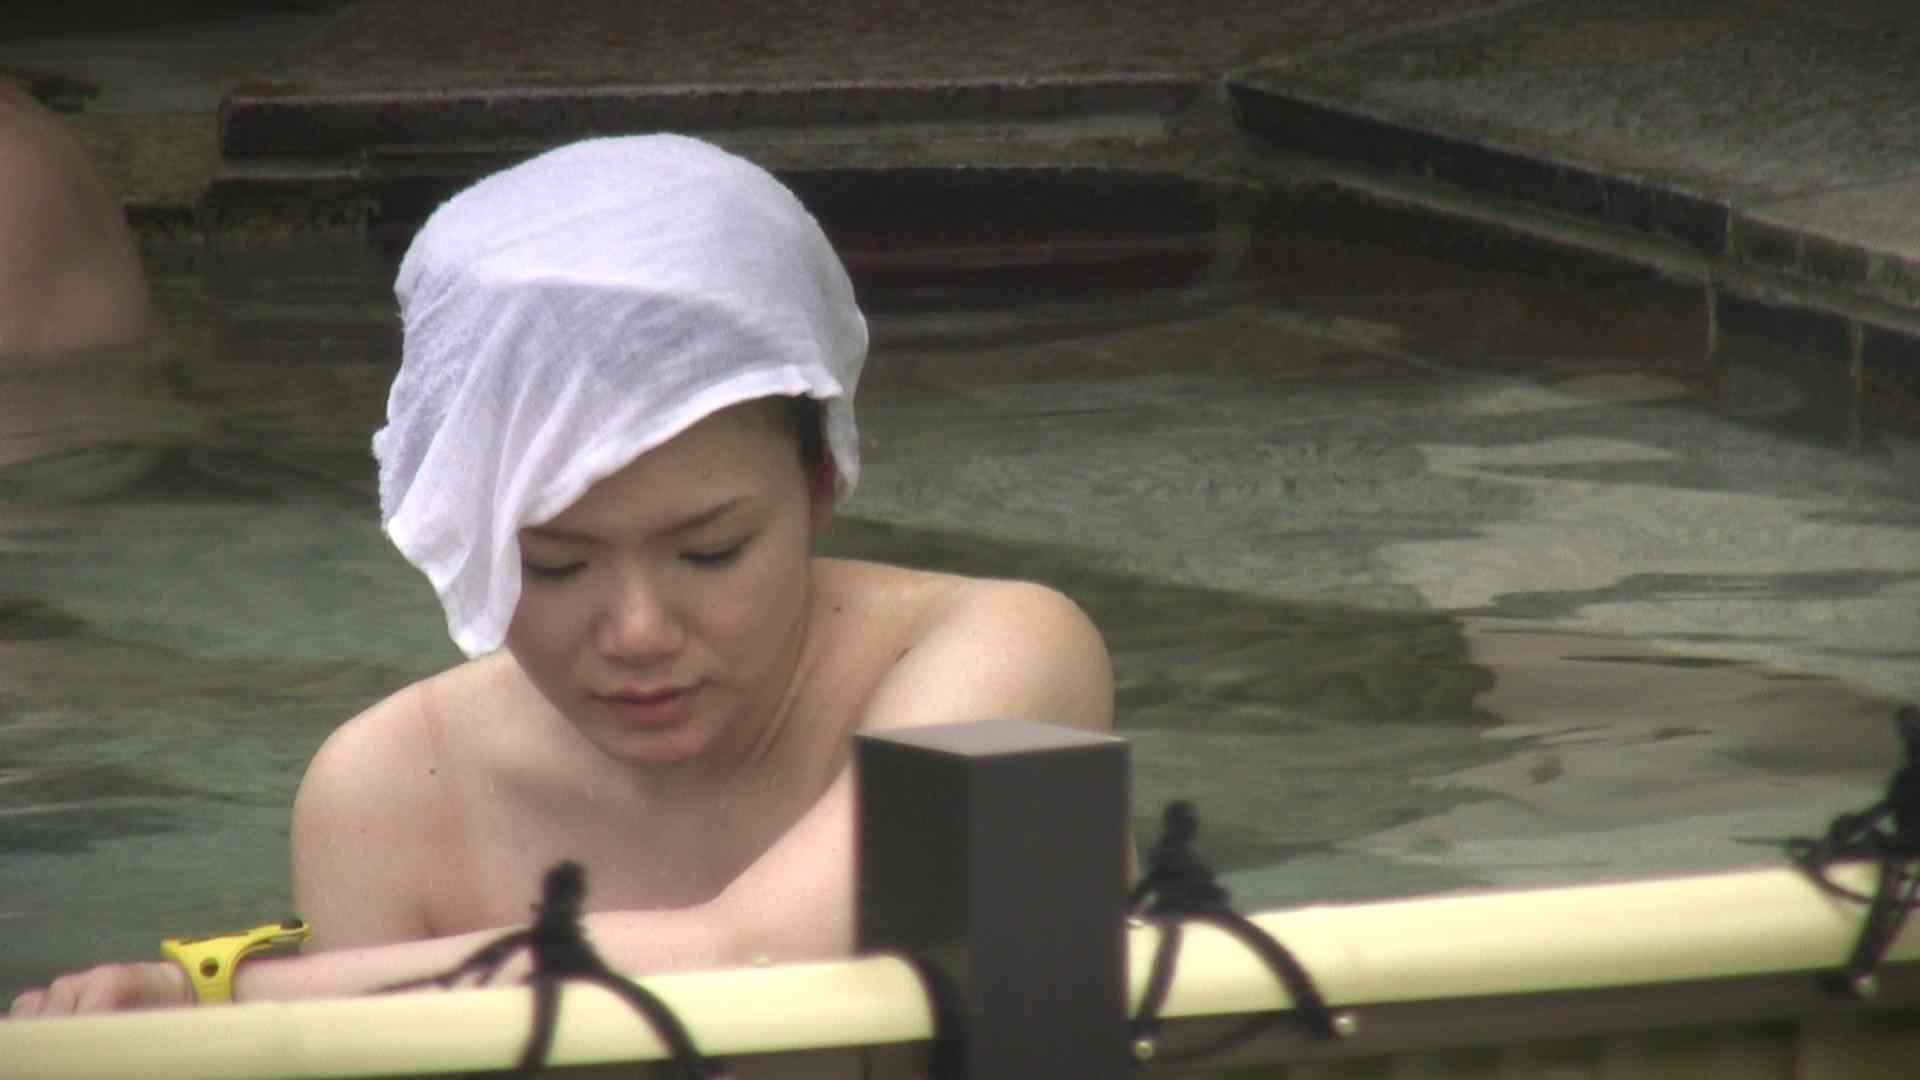 Aquaな露天風呂Vol.12【VIP】 HなOL | 盗撮  83pic 43